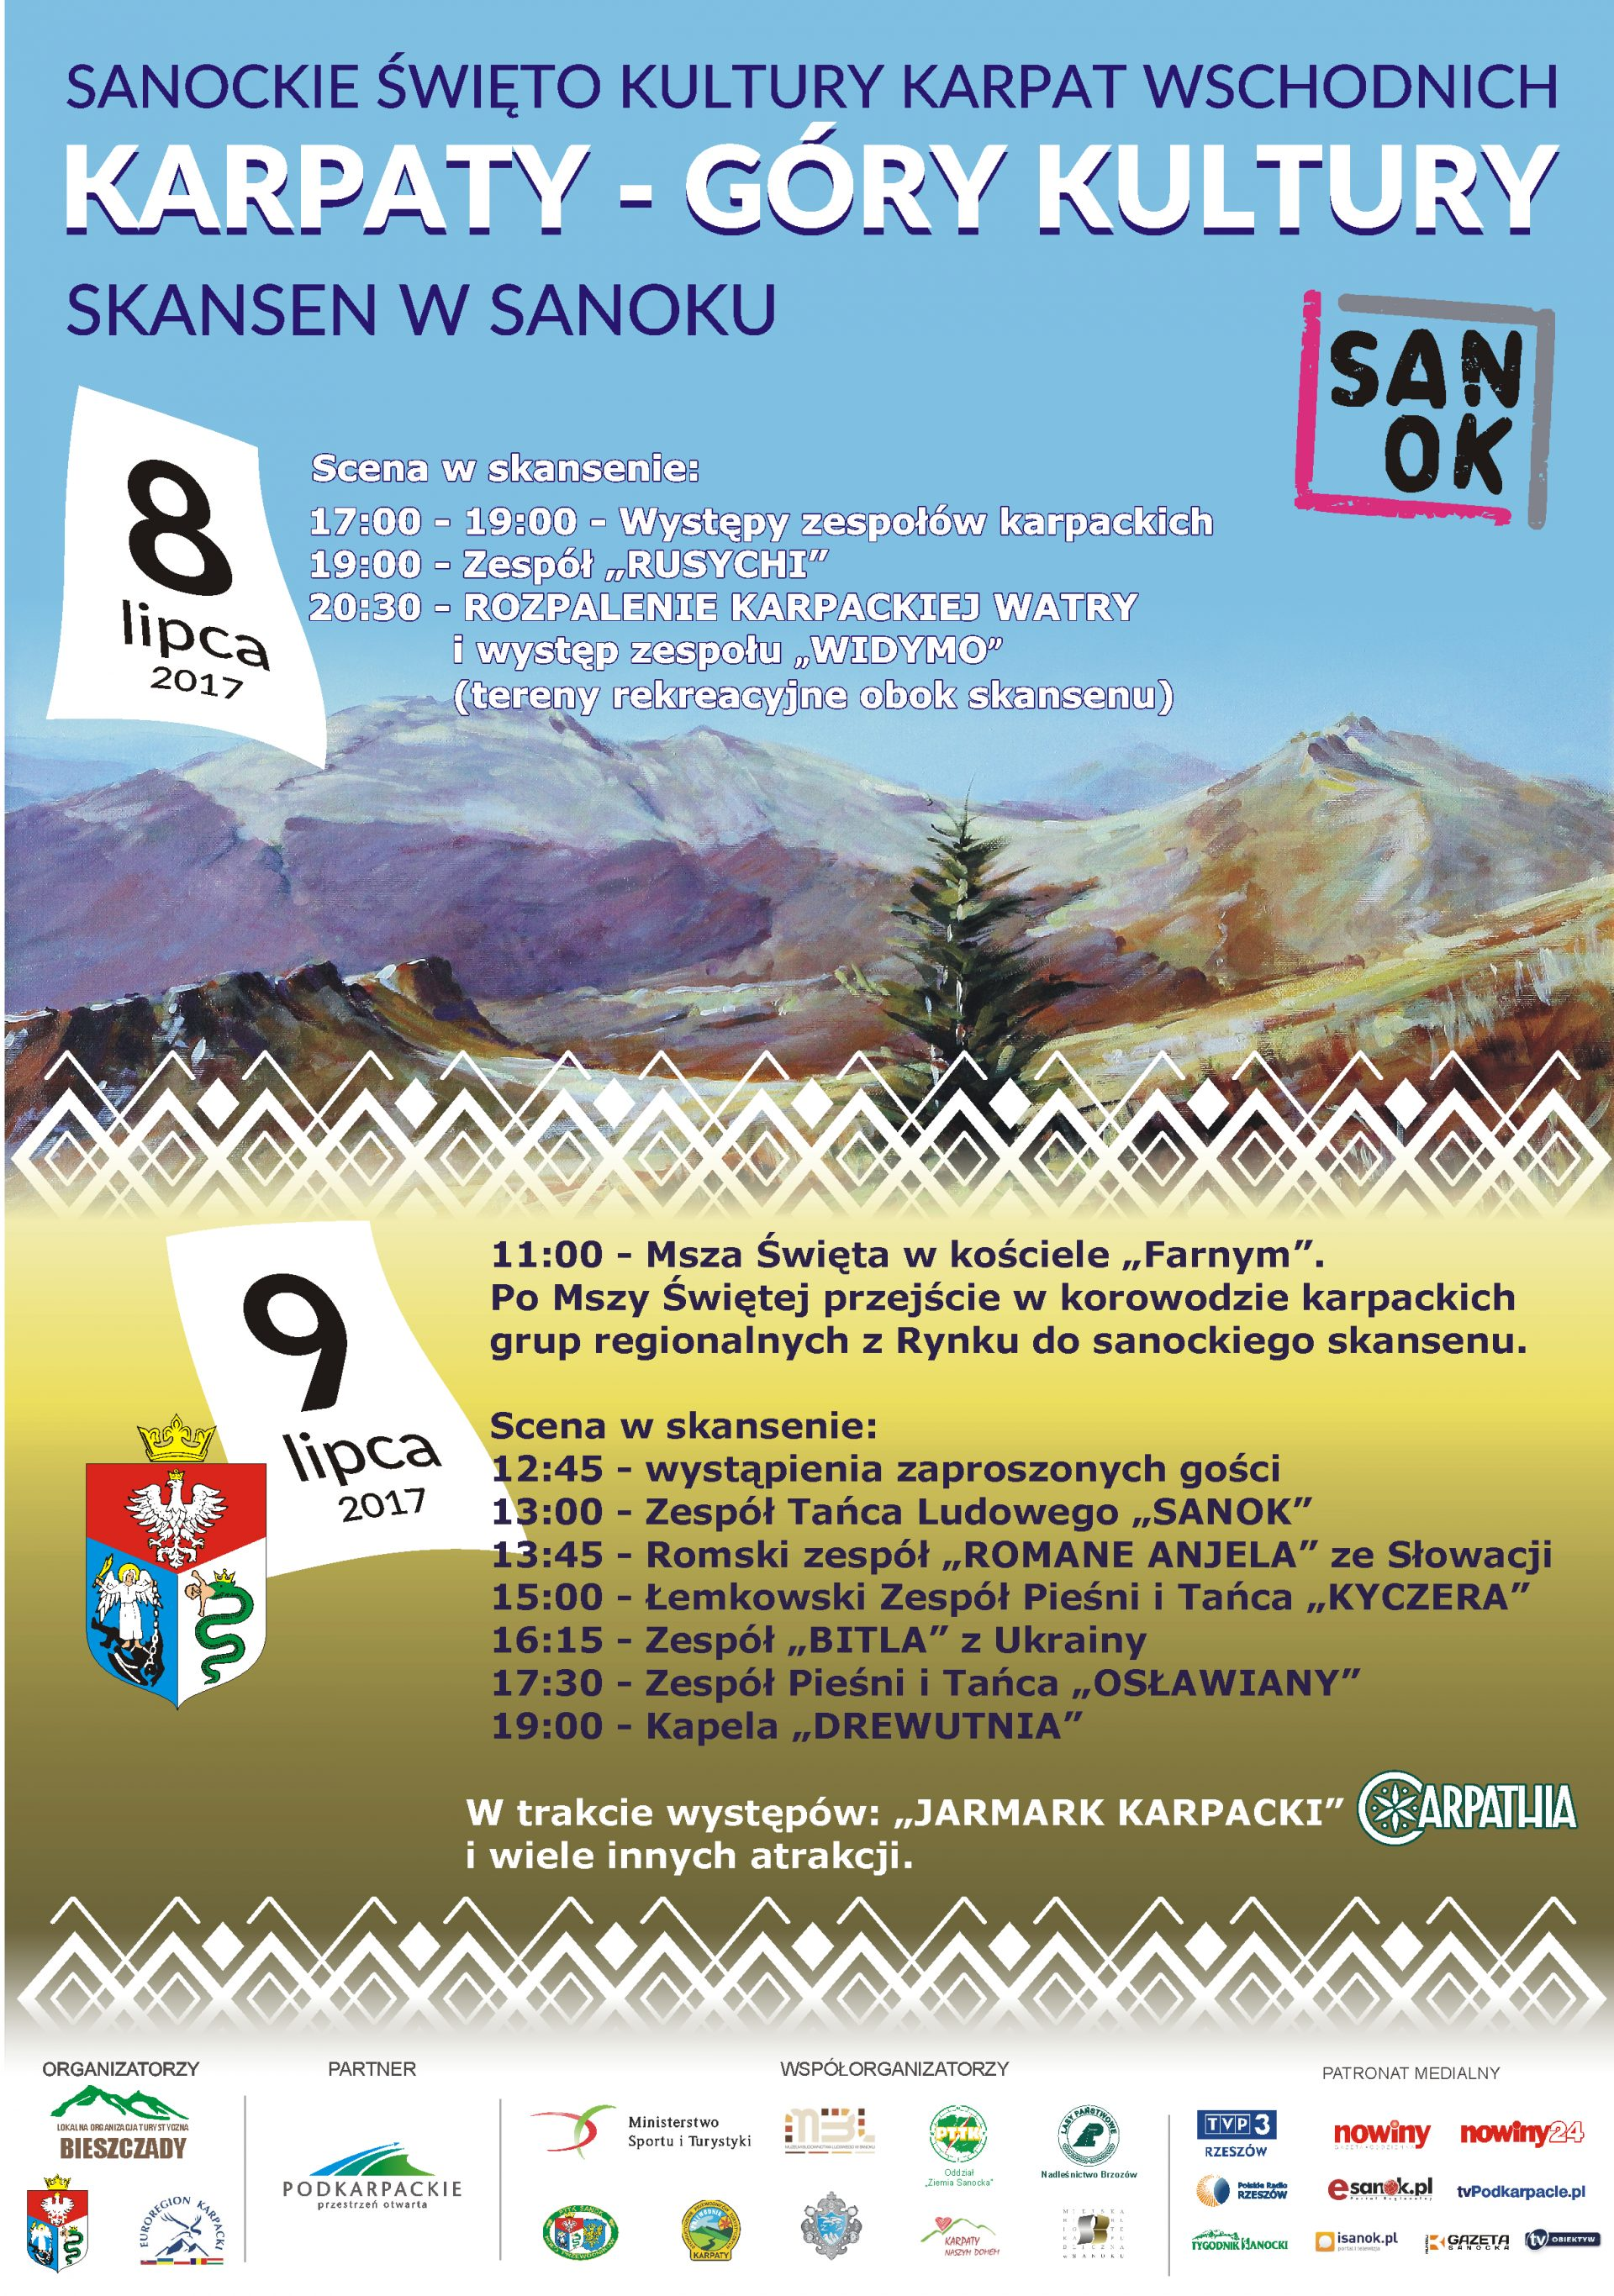 "plakat Karpaty Góry Kultury e1498123675354 - Sanockie Święto Kultury Karpat Wschodnich ""Karpaty - Góry Kultury"""